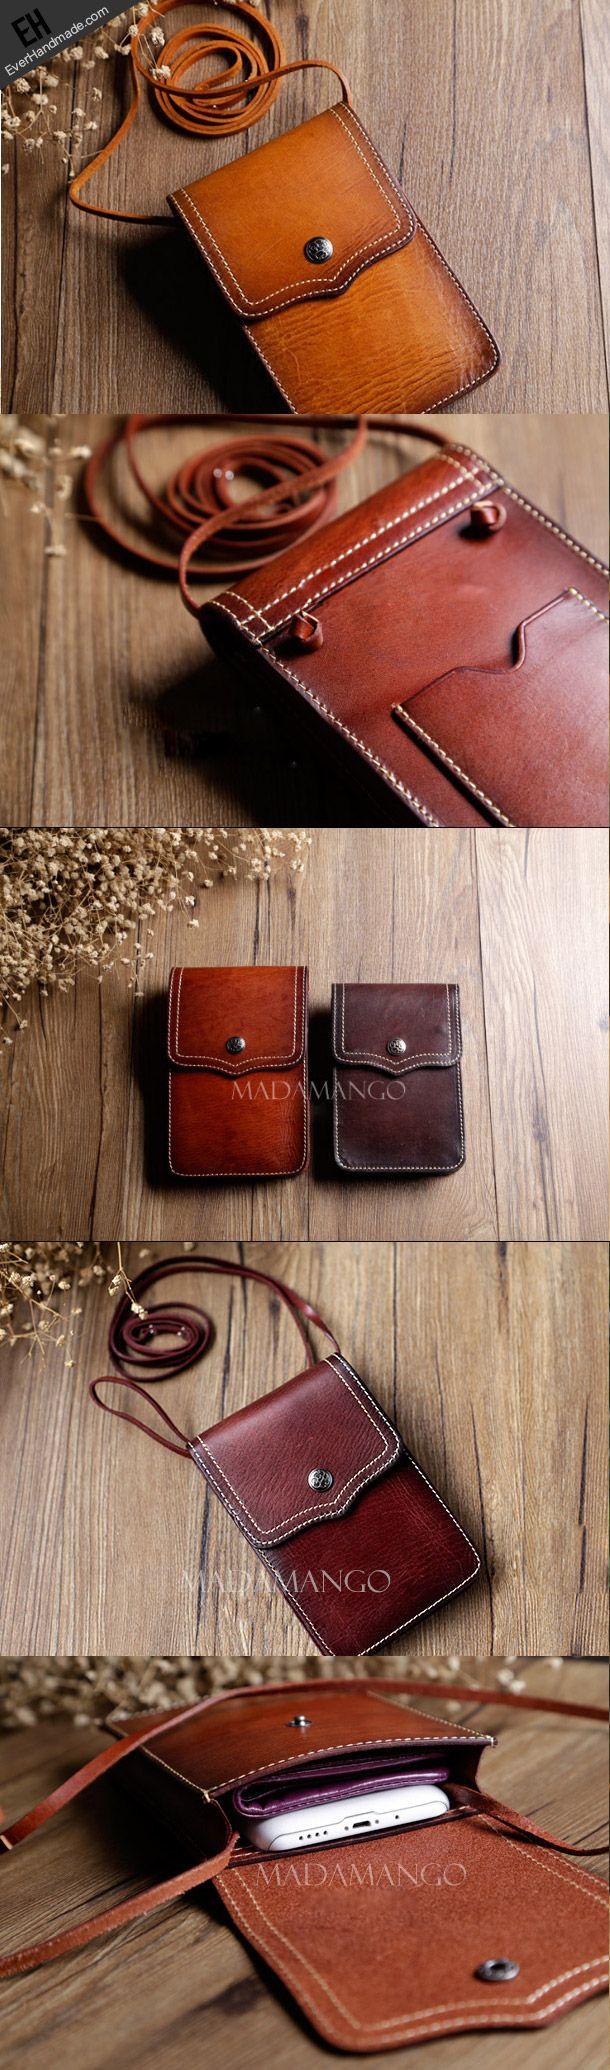 Handmade Leather phone bag shoulder bag for women leather crossbody ...